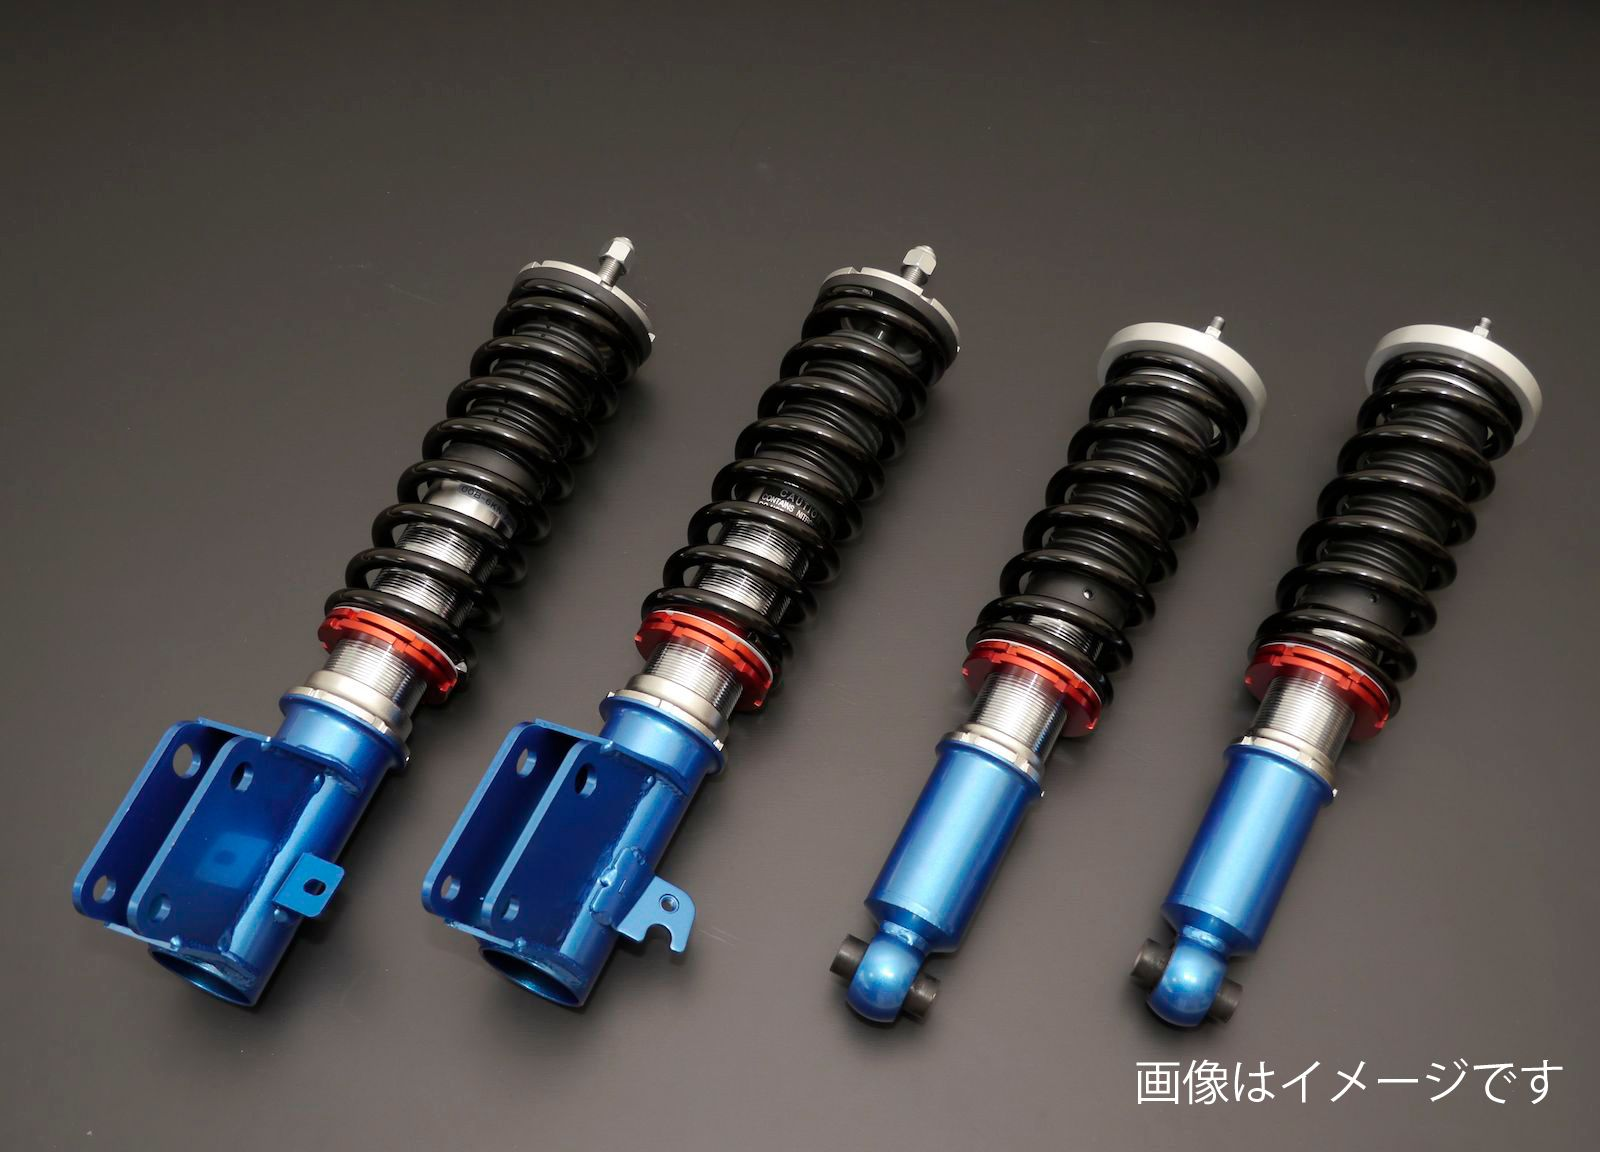 CUSCO(クスコ) 車高調キット street ZERO 日産 フェアレディZ Z34 2008.12- 商品番号:252 61P CN